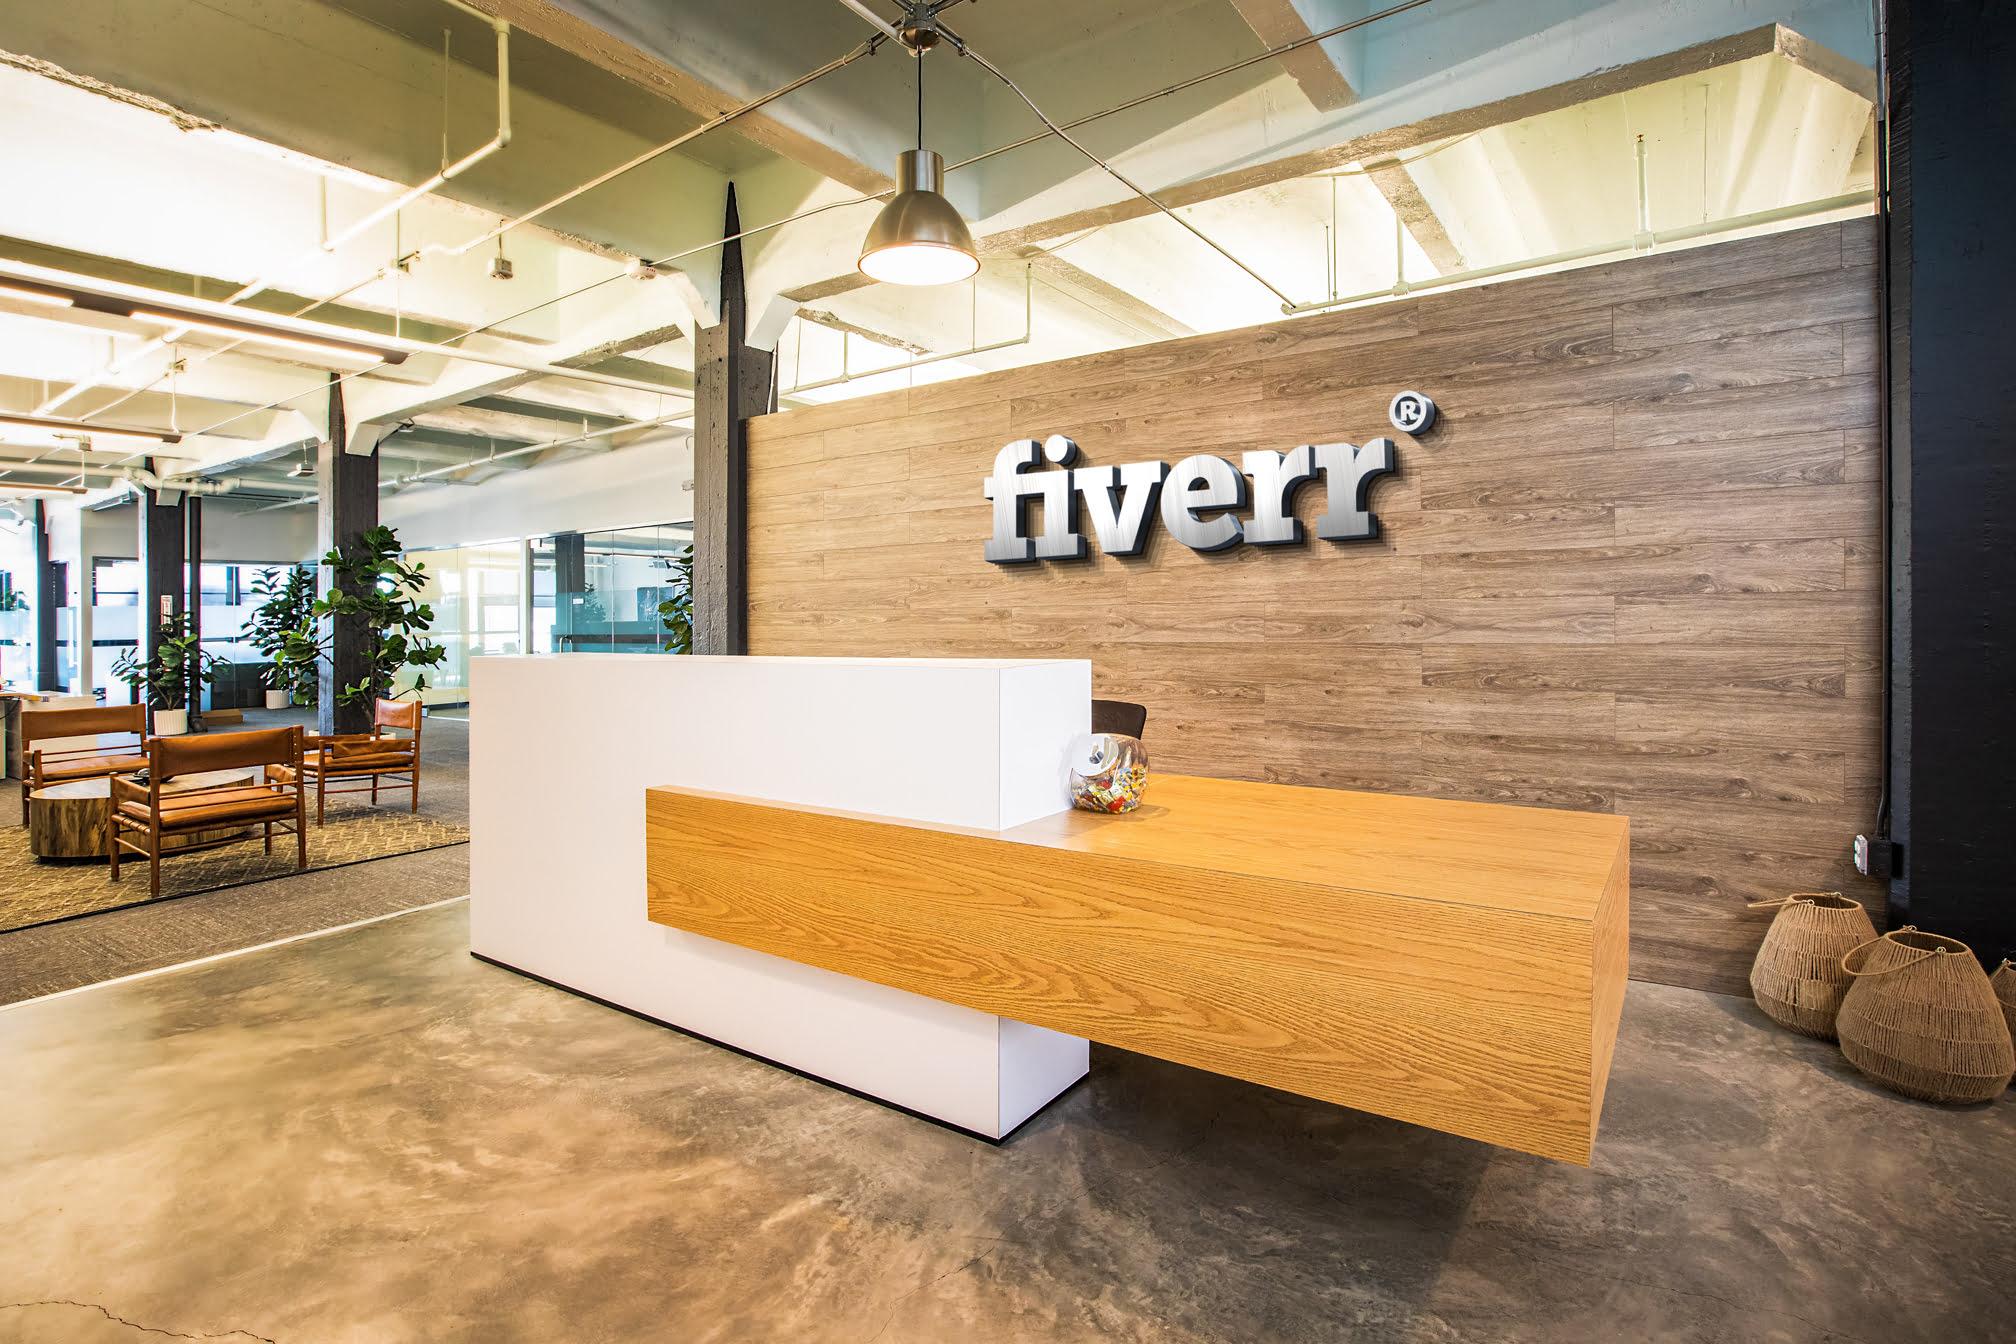 Fiverr-Free-Reception-Desk-Mockup